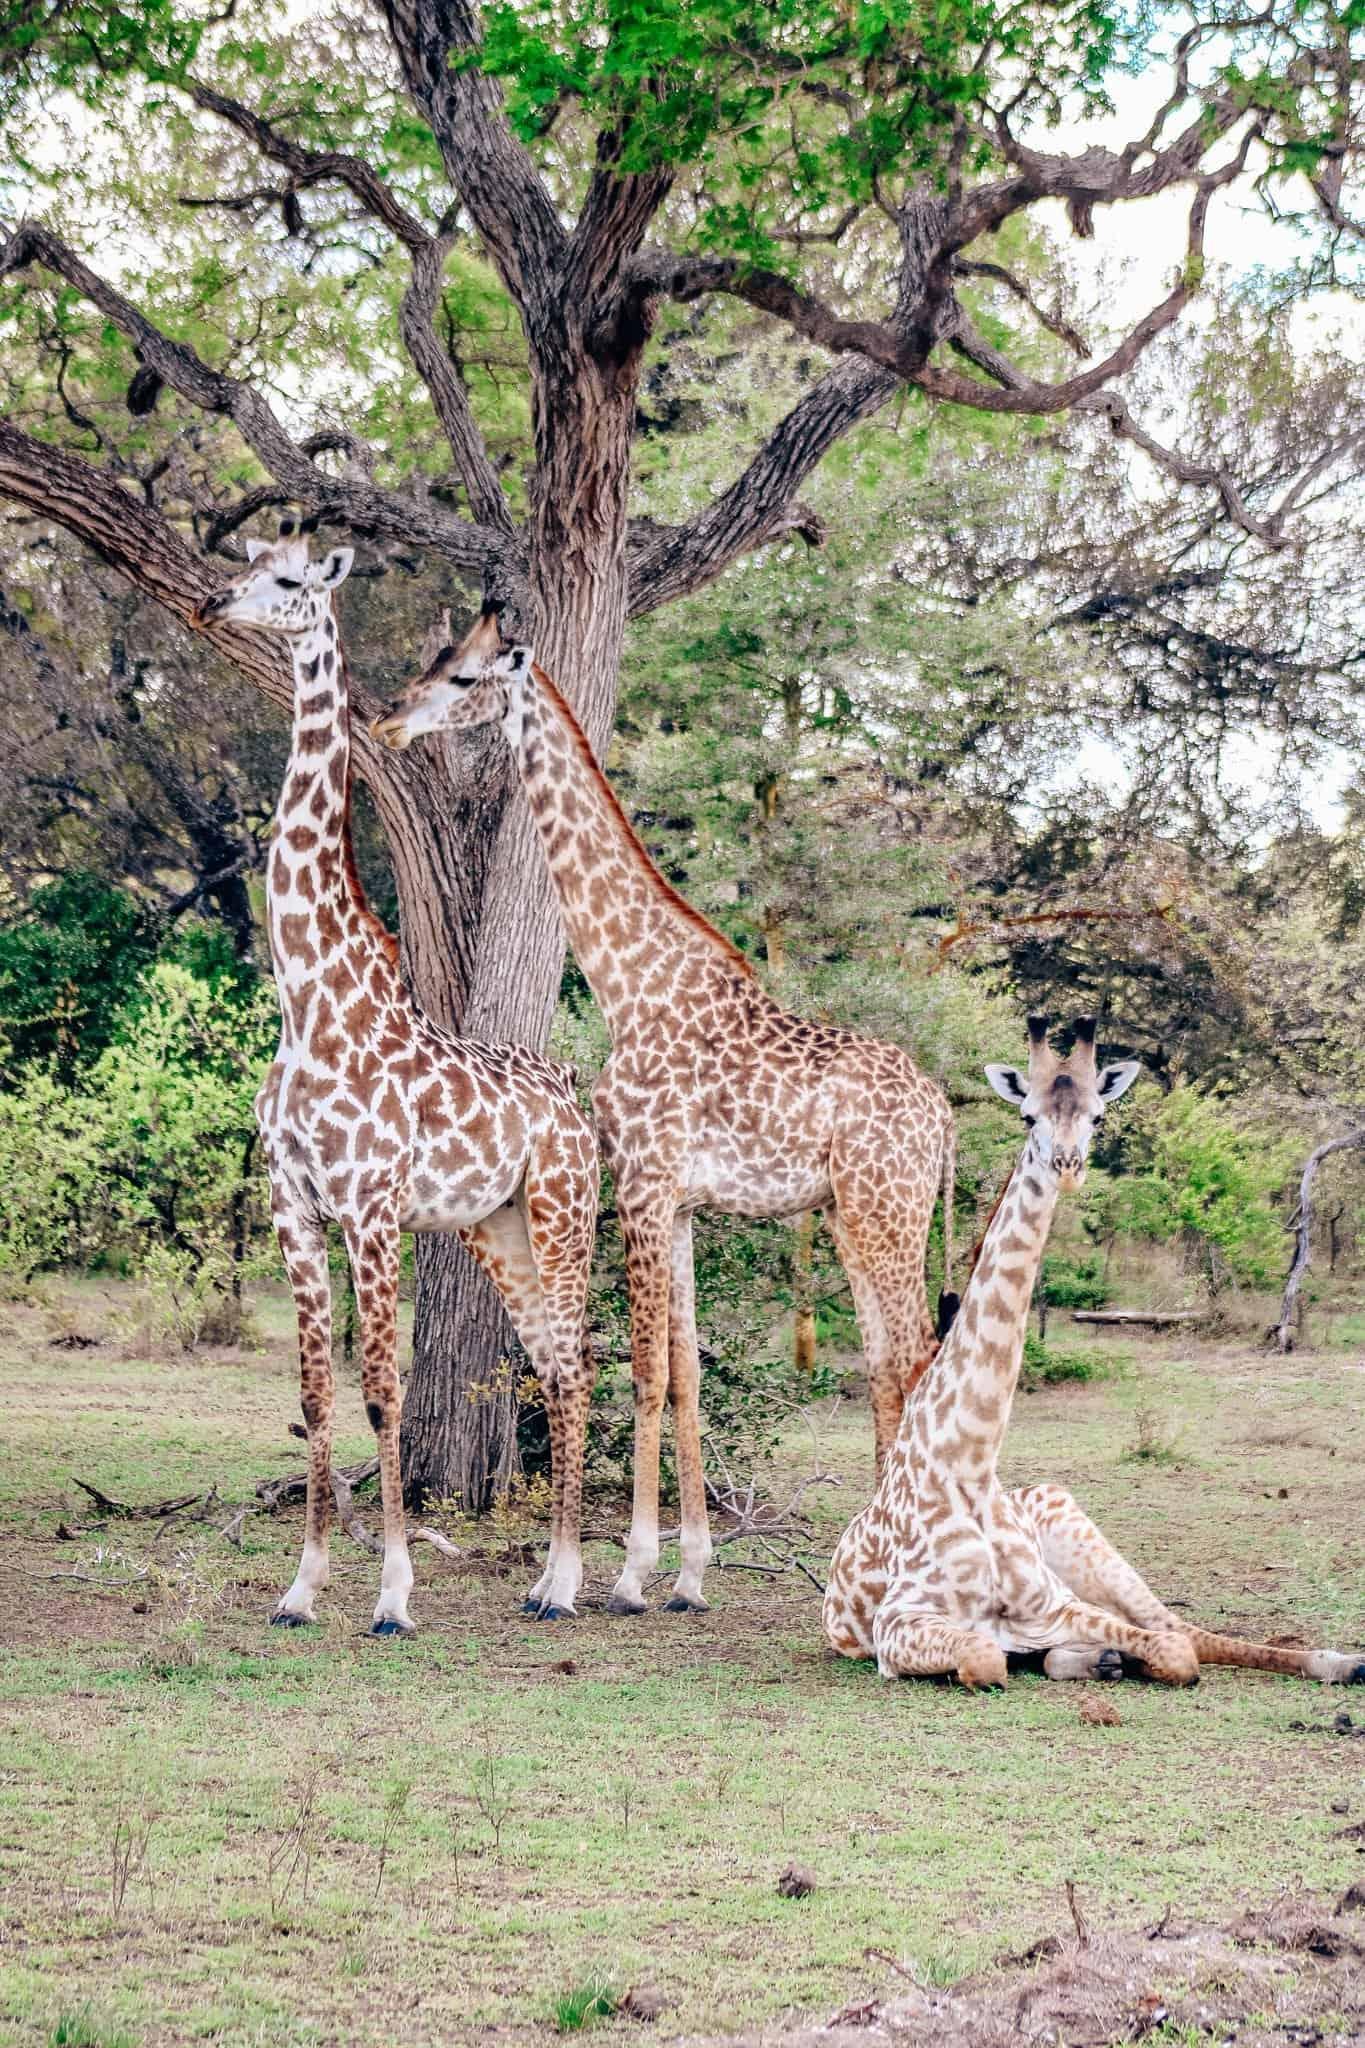 Giraffe Family on African Safari Drive in the Selous Game Reserve